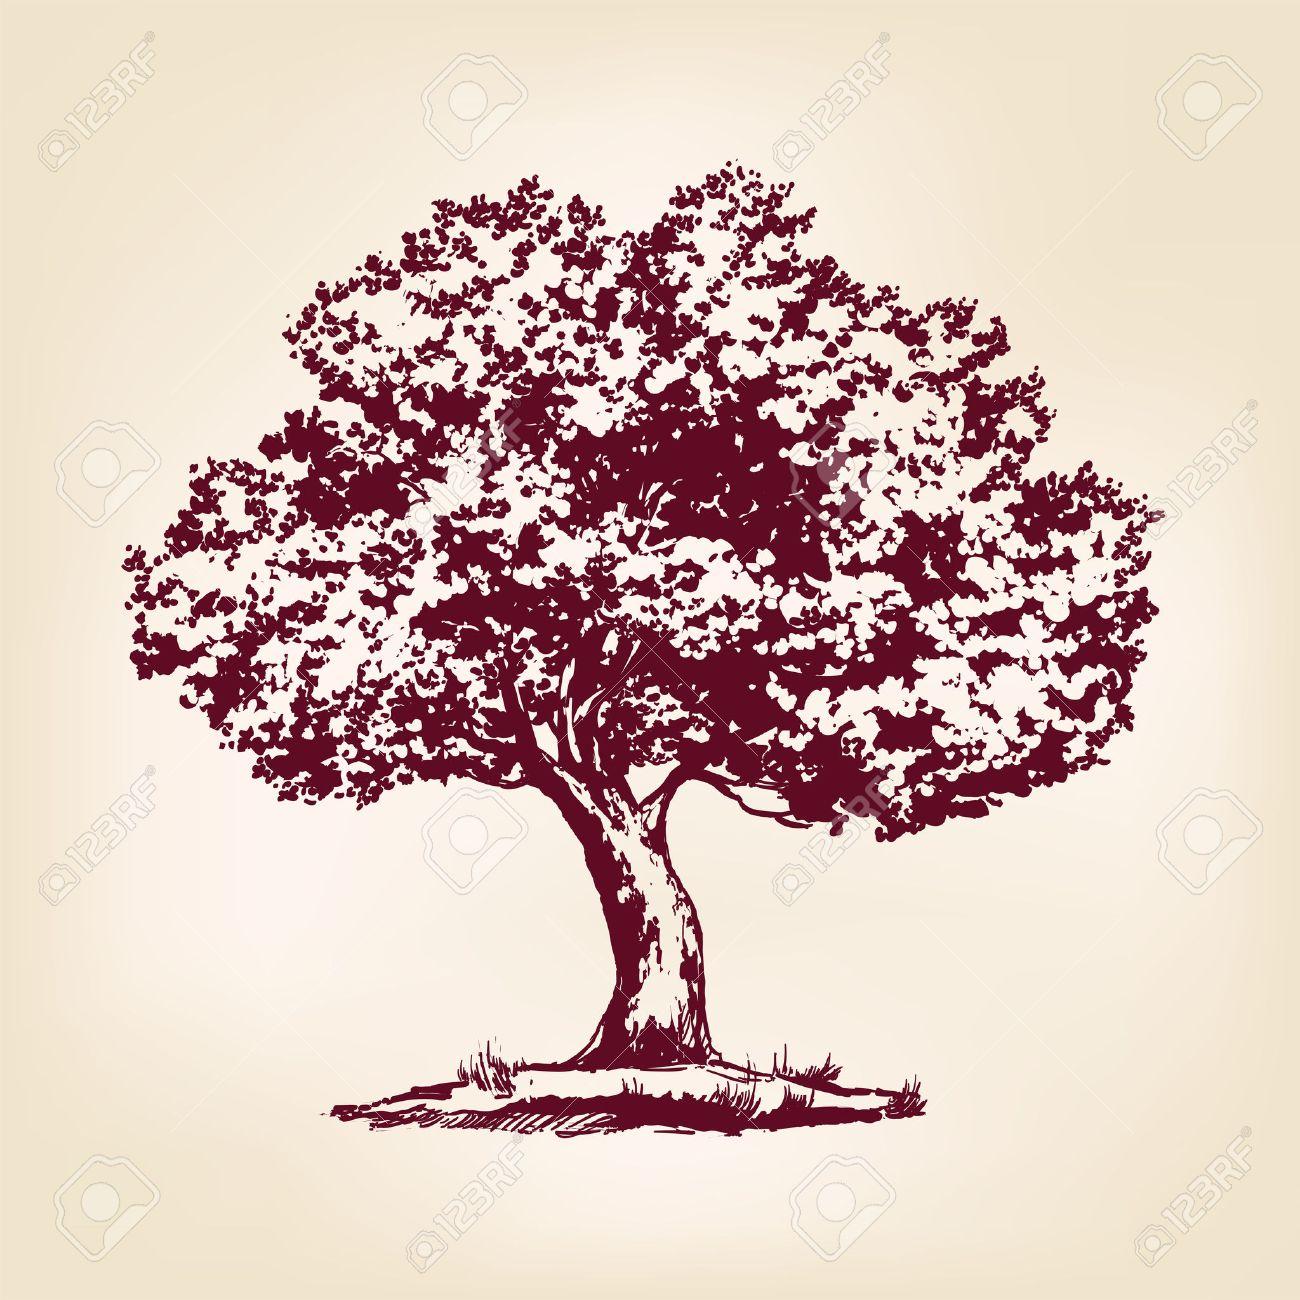 Tree hand drawn vector llustration realistic sketch Stock Vector - 42442574